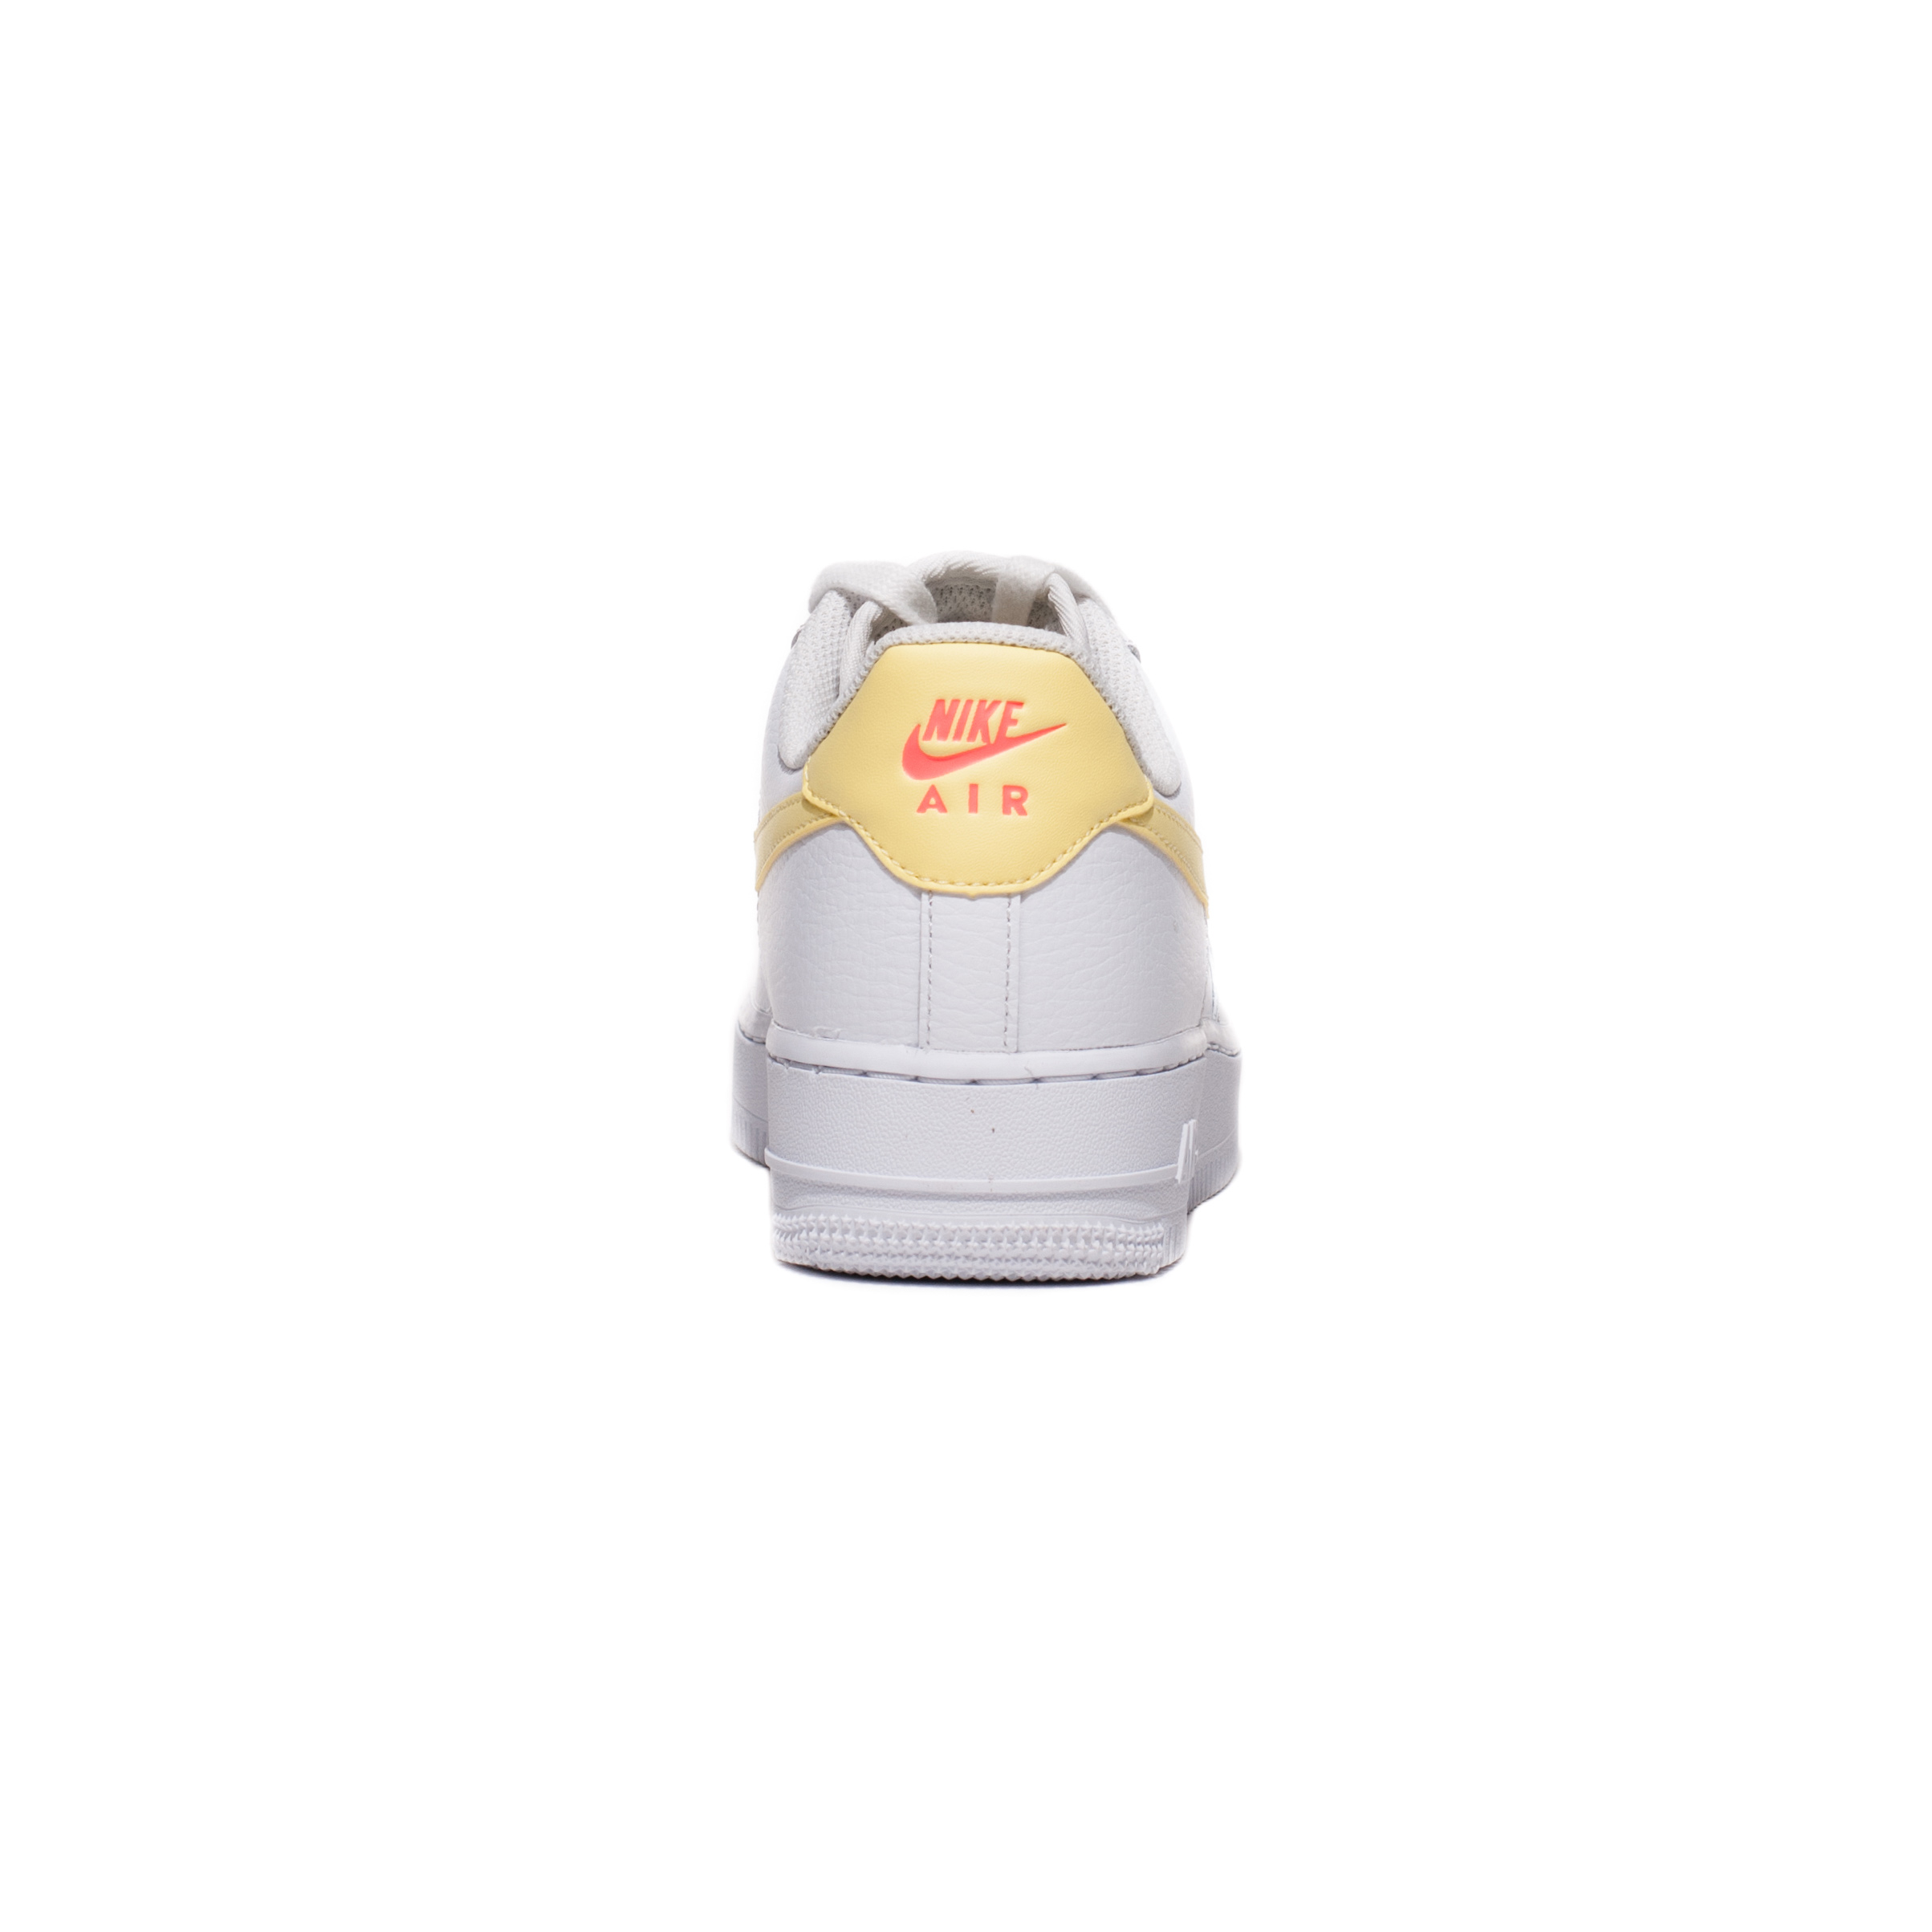 Кросівки жіночі Nike AIR FORCE 1 '07 ESSENTIAL